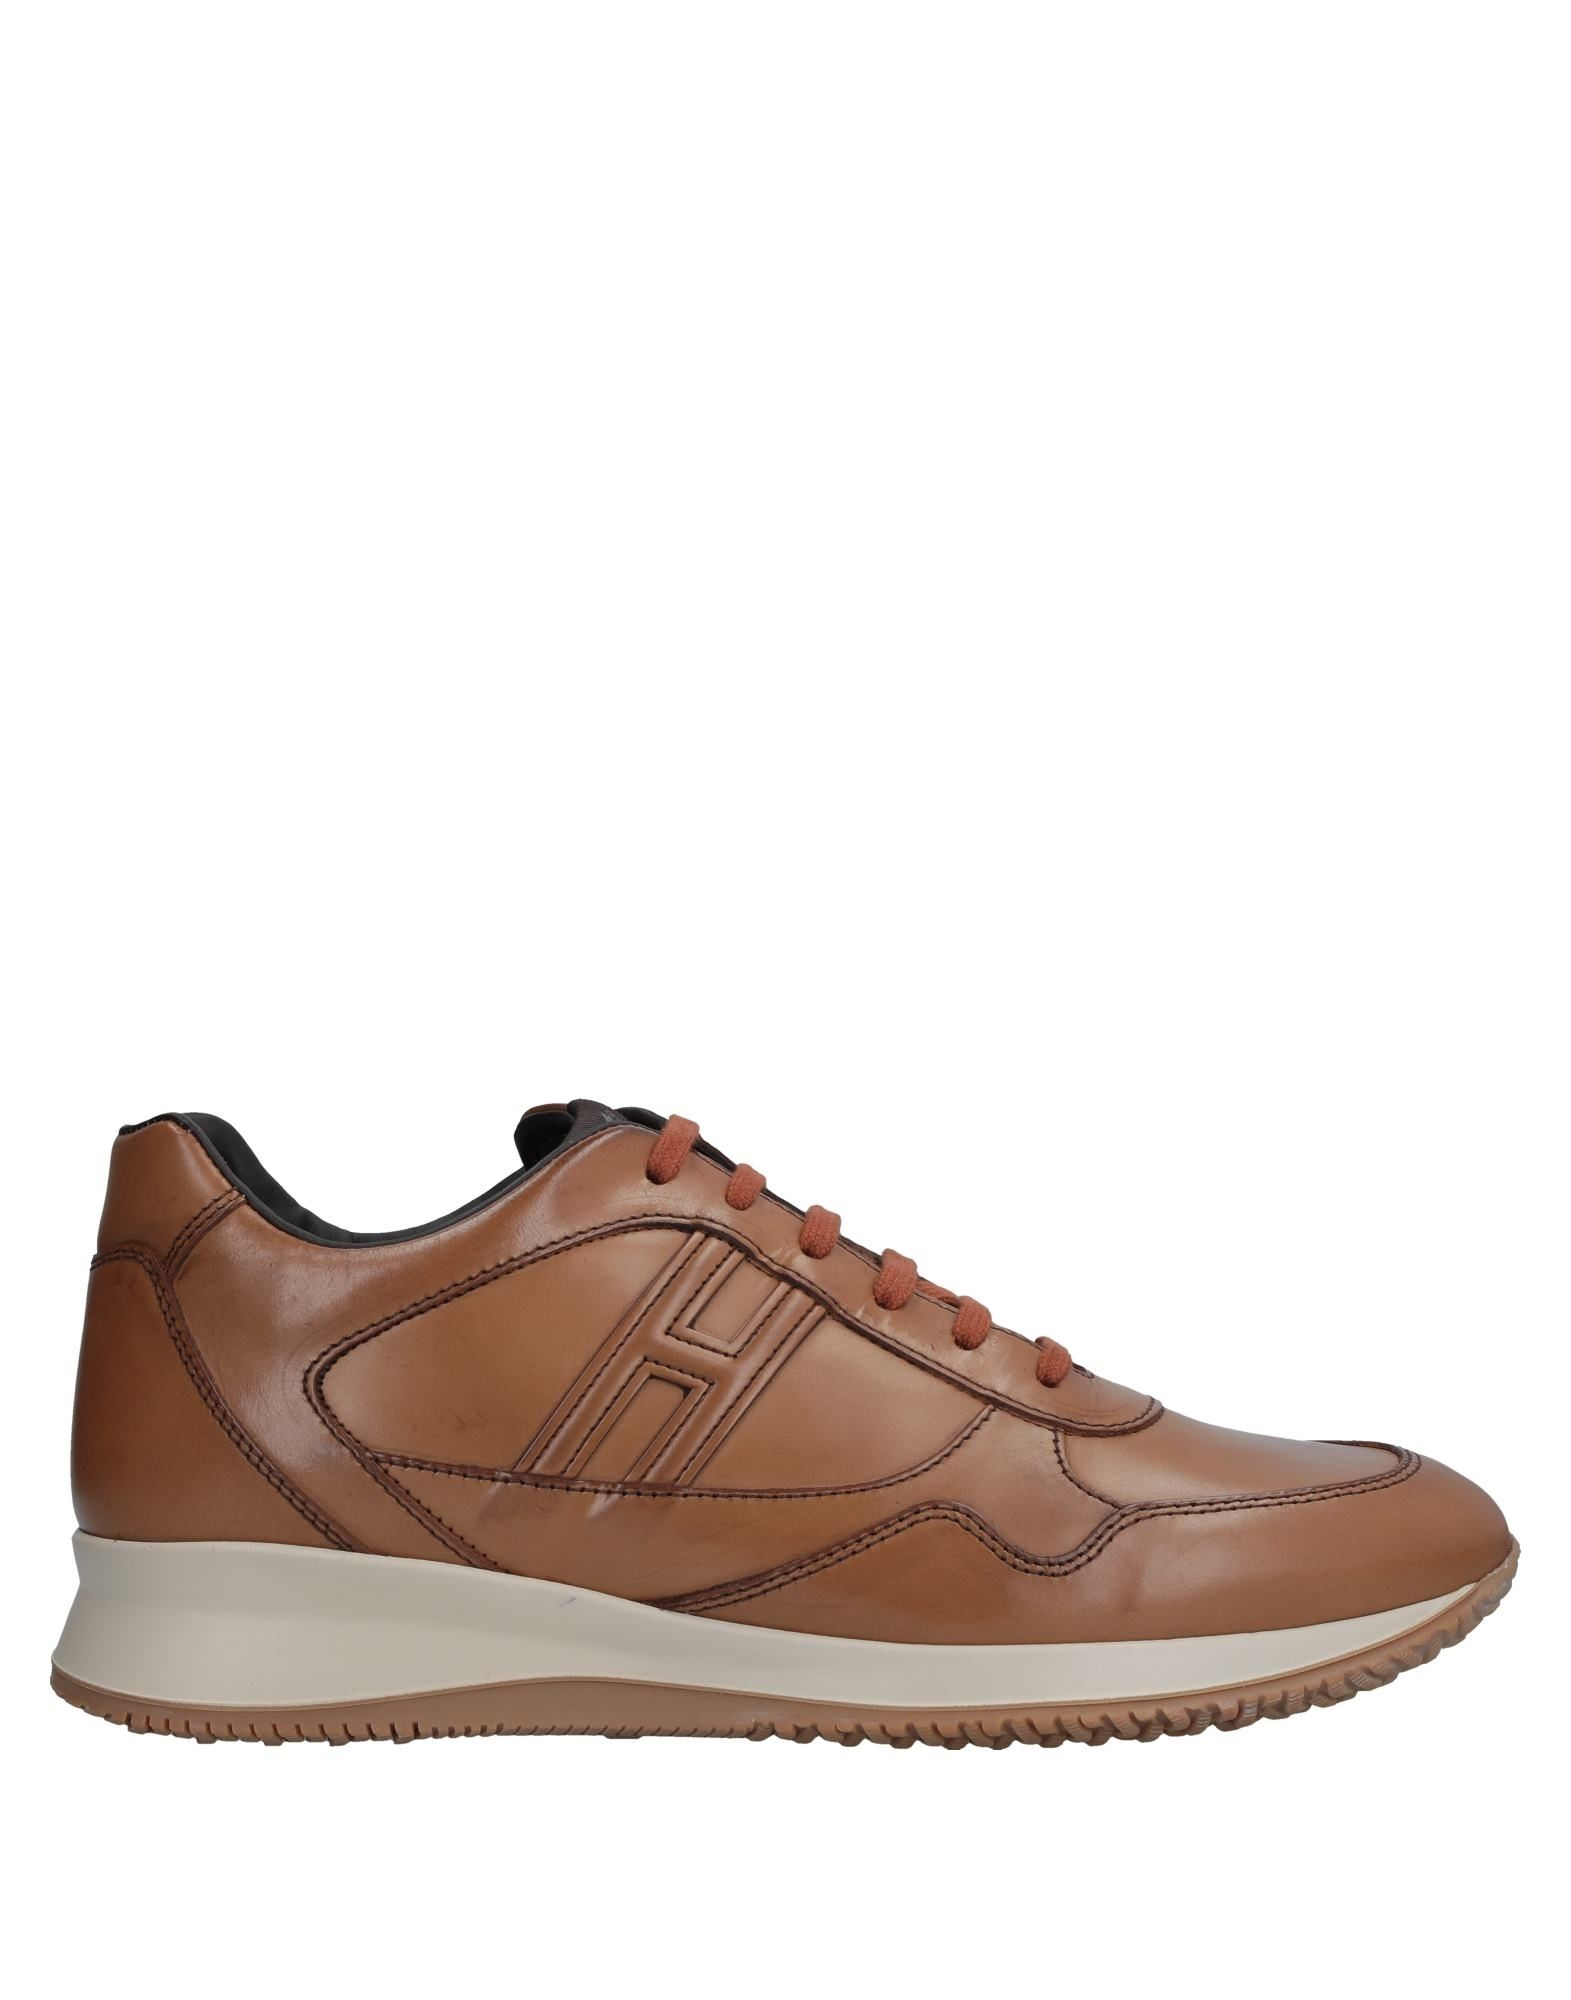 Hogan Sneakers Herren  11539374QJ Gute Qualität beliebte Schuhe